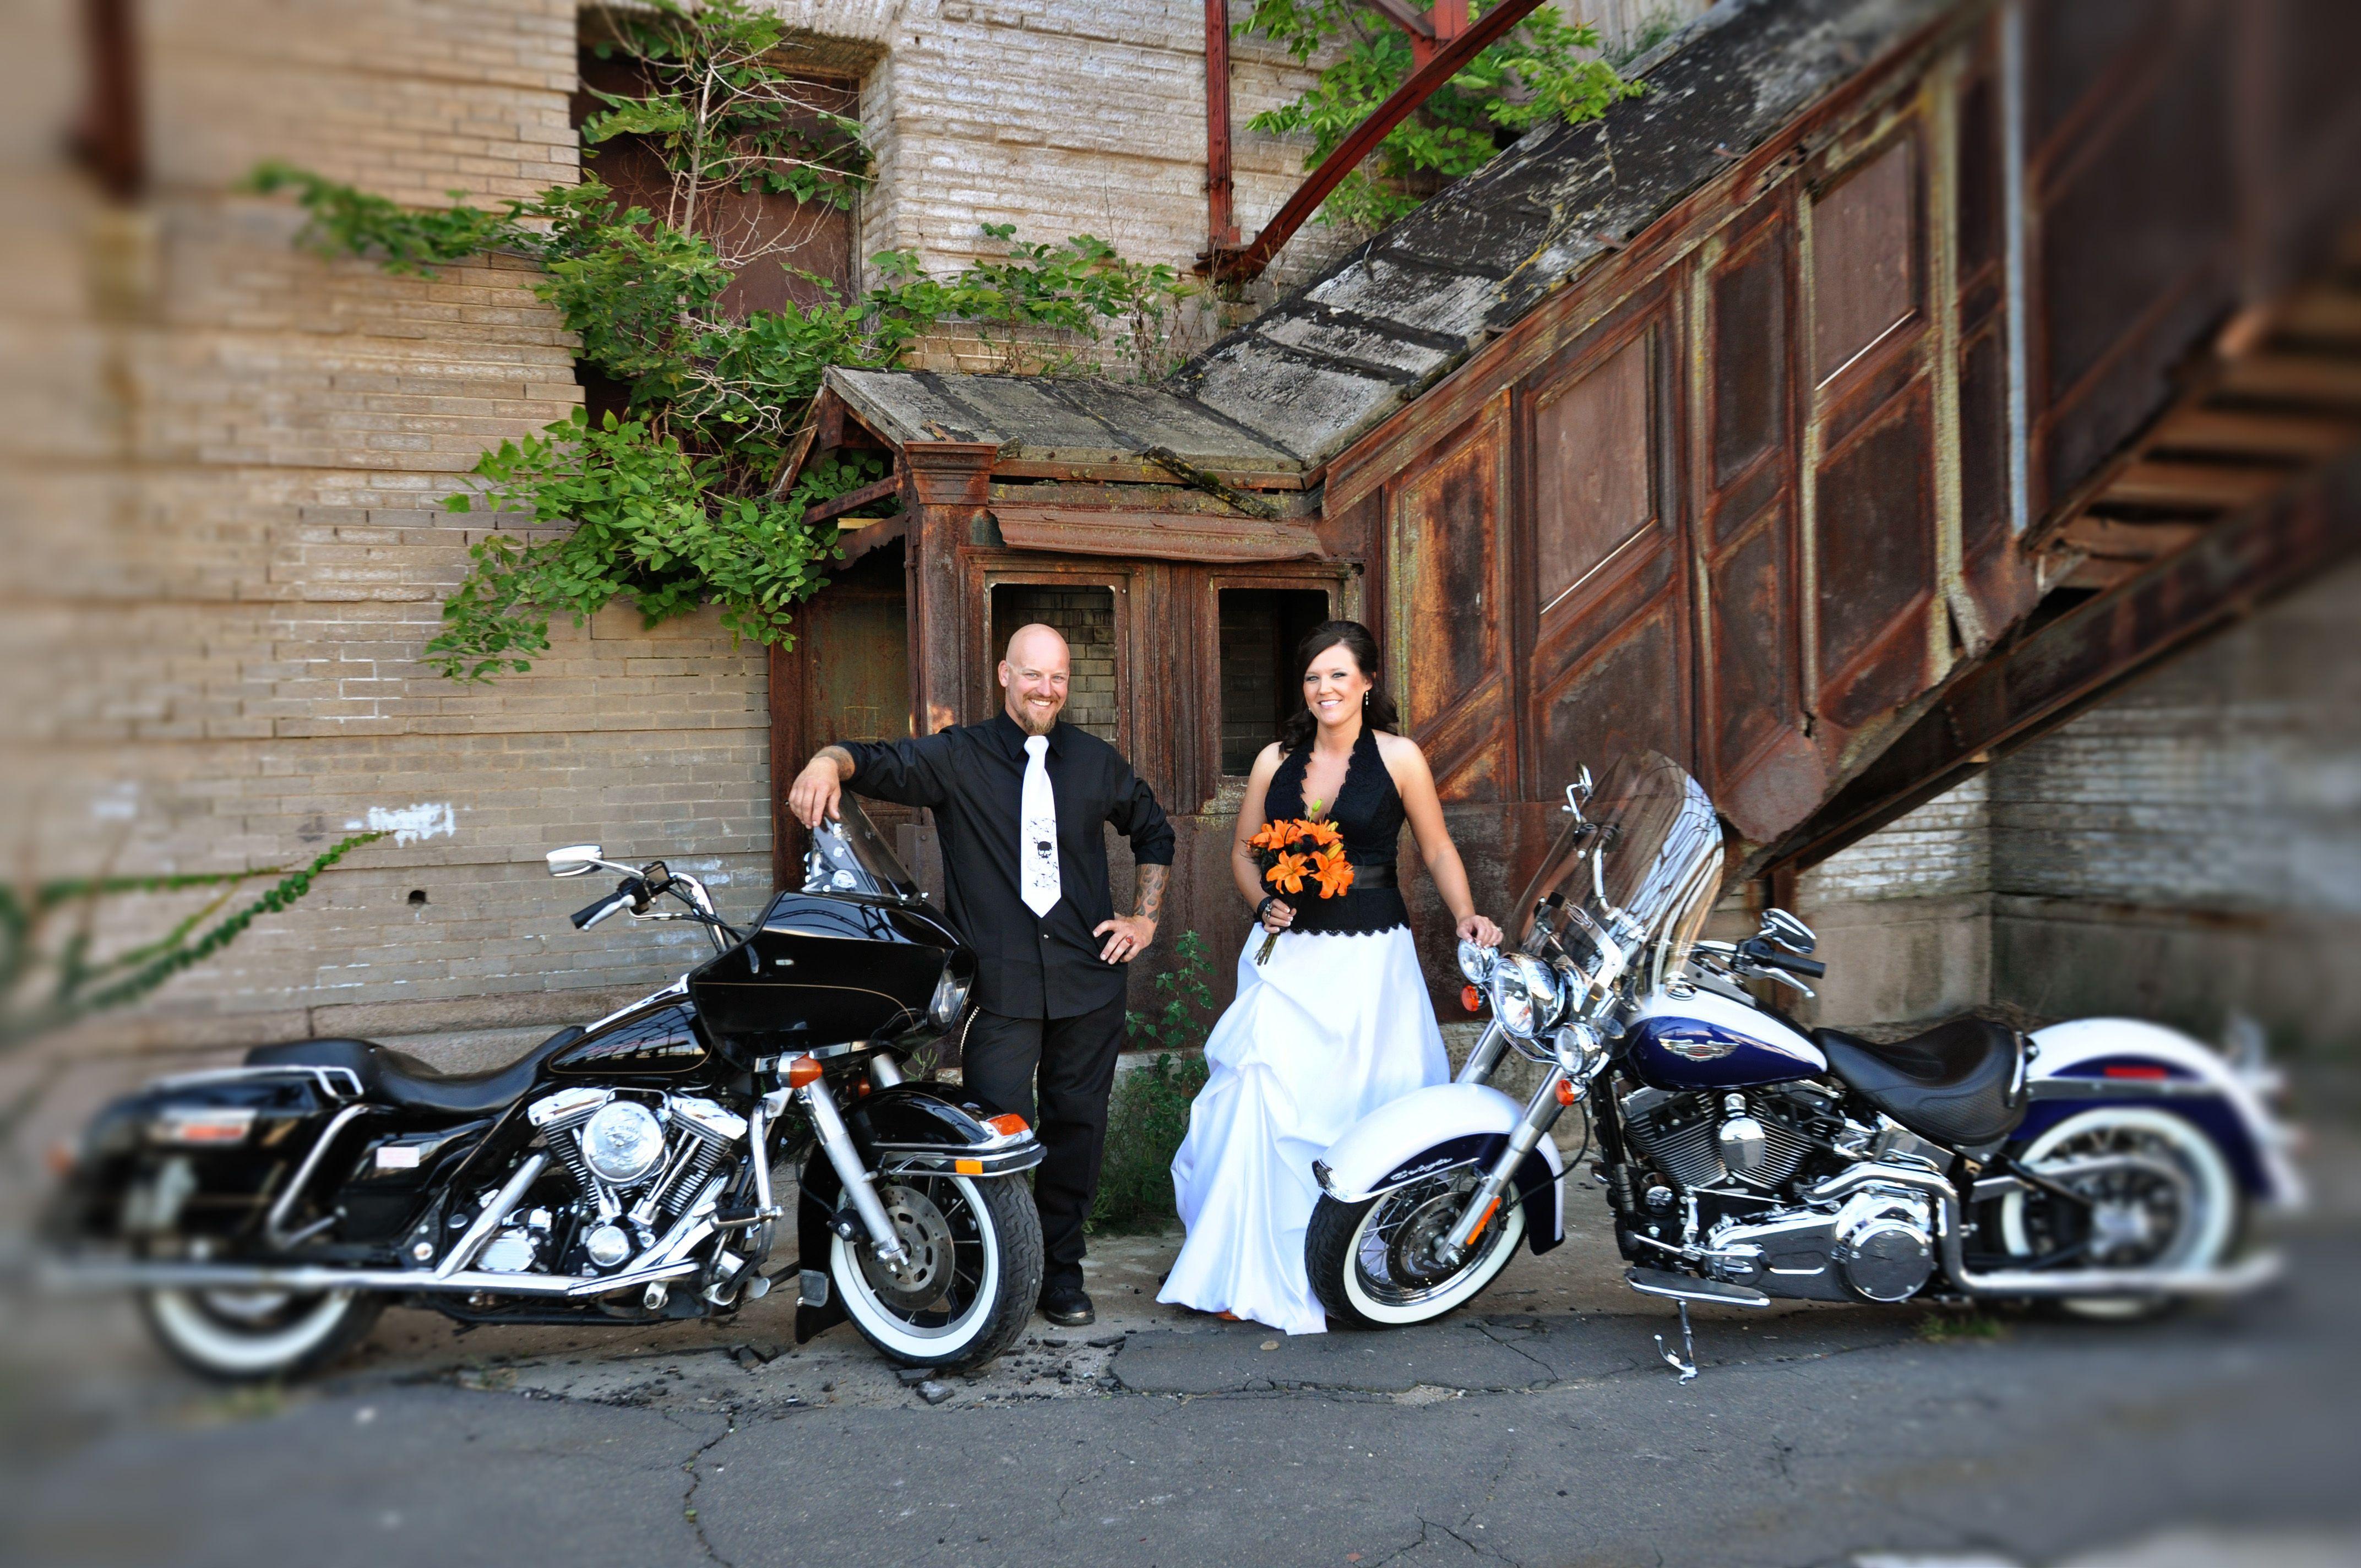 Our Harley Davidson Wedding Part 1 Harley Davidson Wedding Biker Wedding Motorcycle Wedding